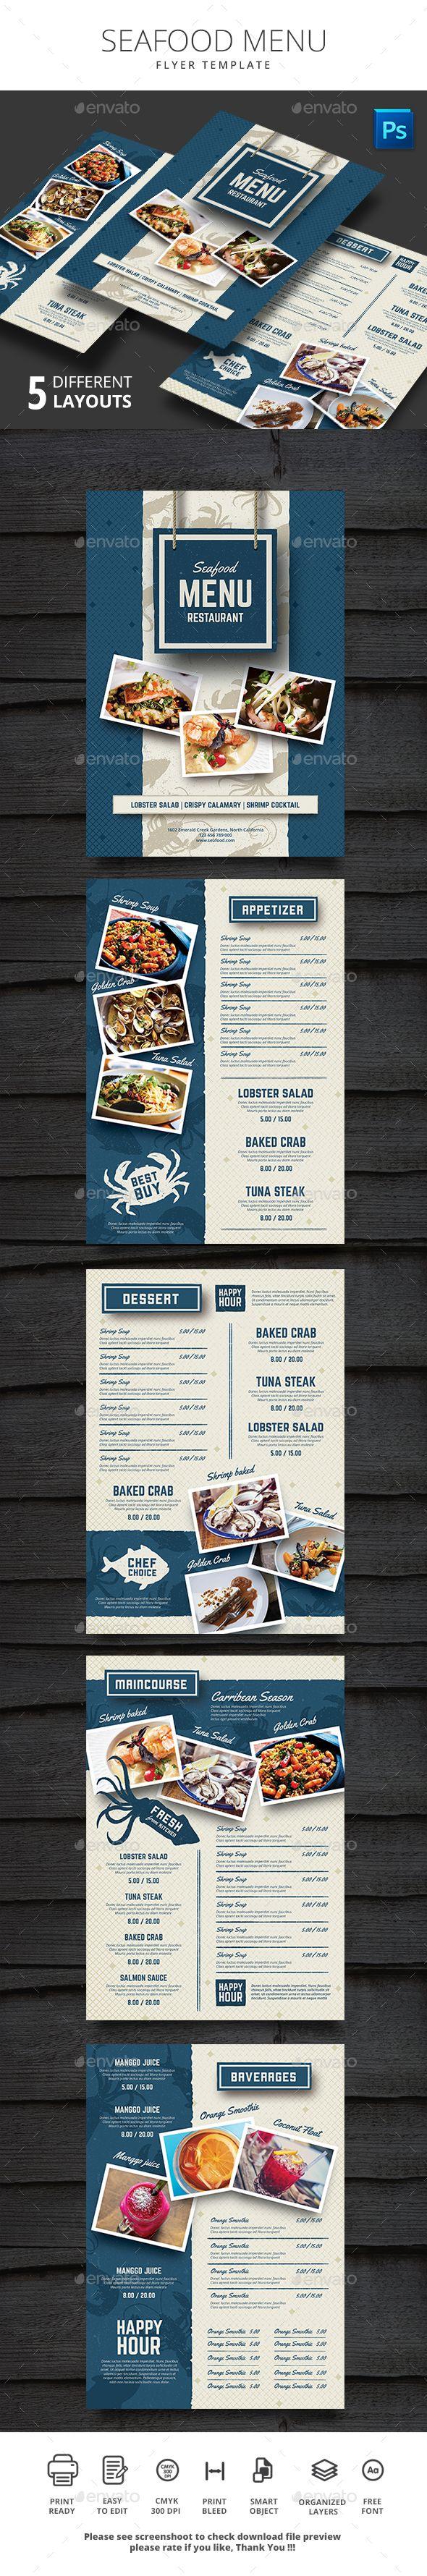 Seafood Restauran Menu Design Template - Food Menus Print Template PSD Template. Download here: https://graphicriver.net/item/seafood-restauran-menu/18706100?ref=yinkira